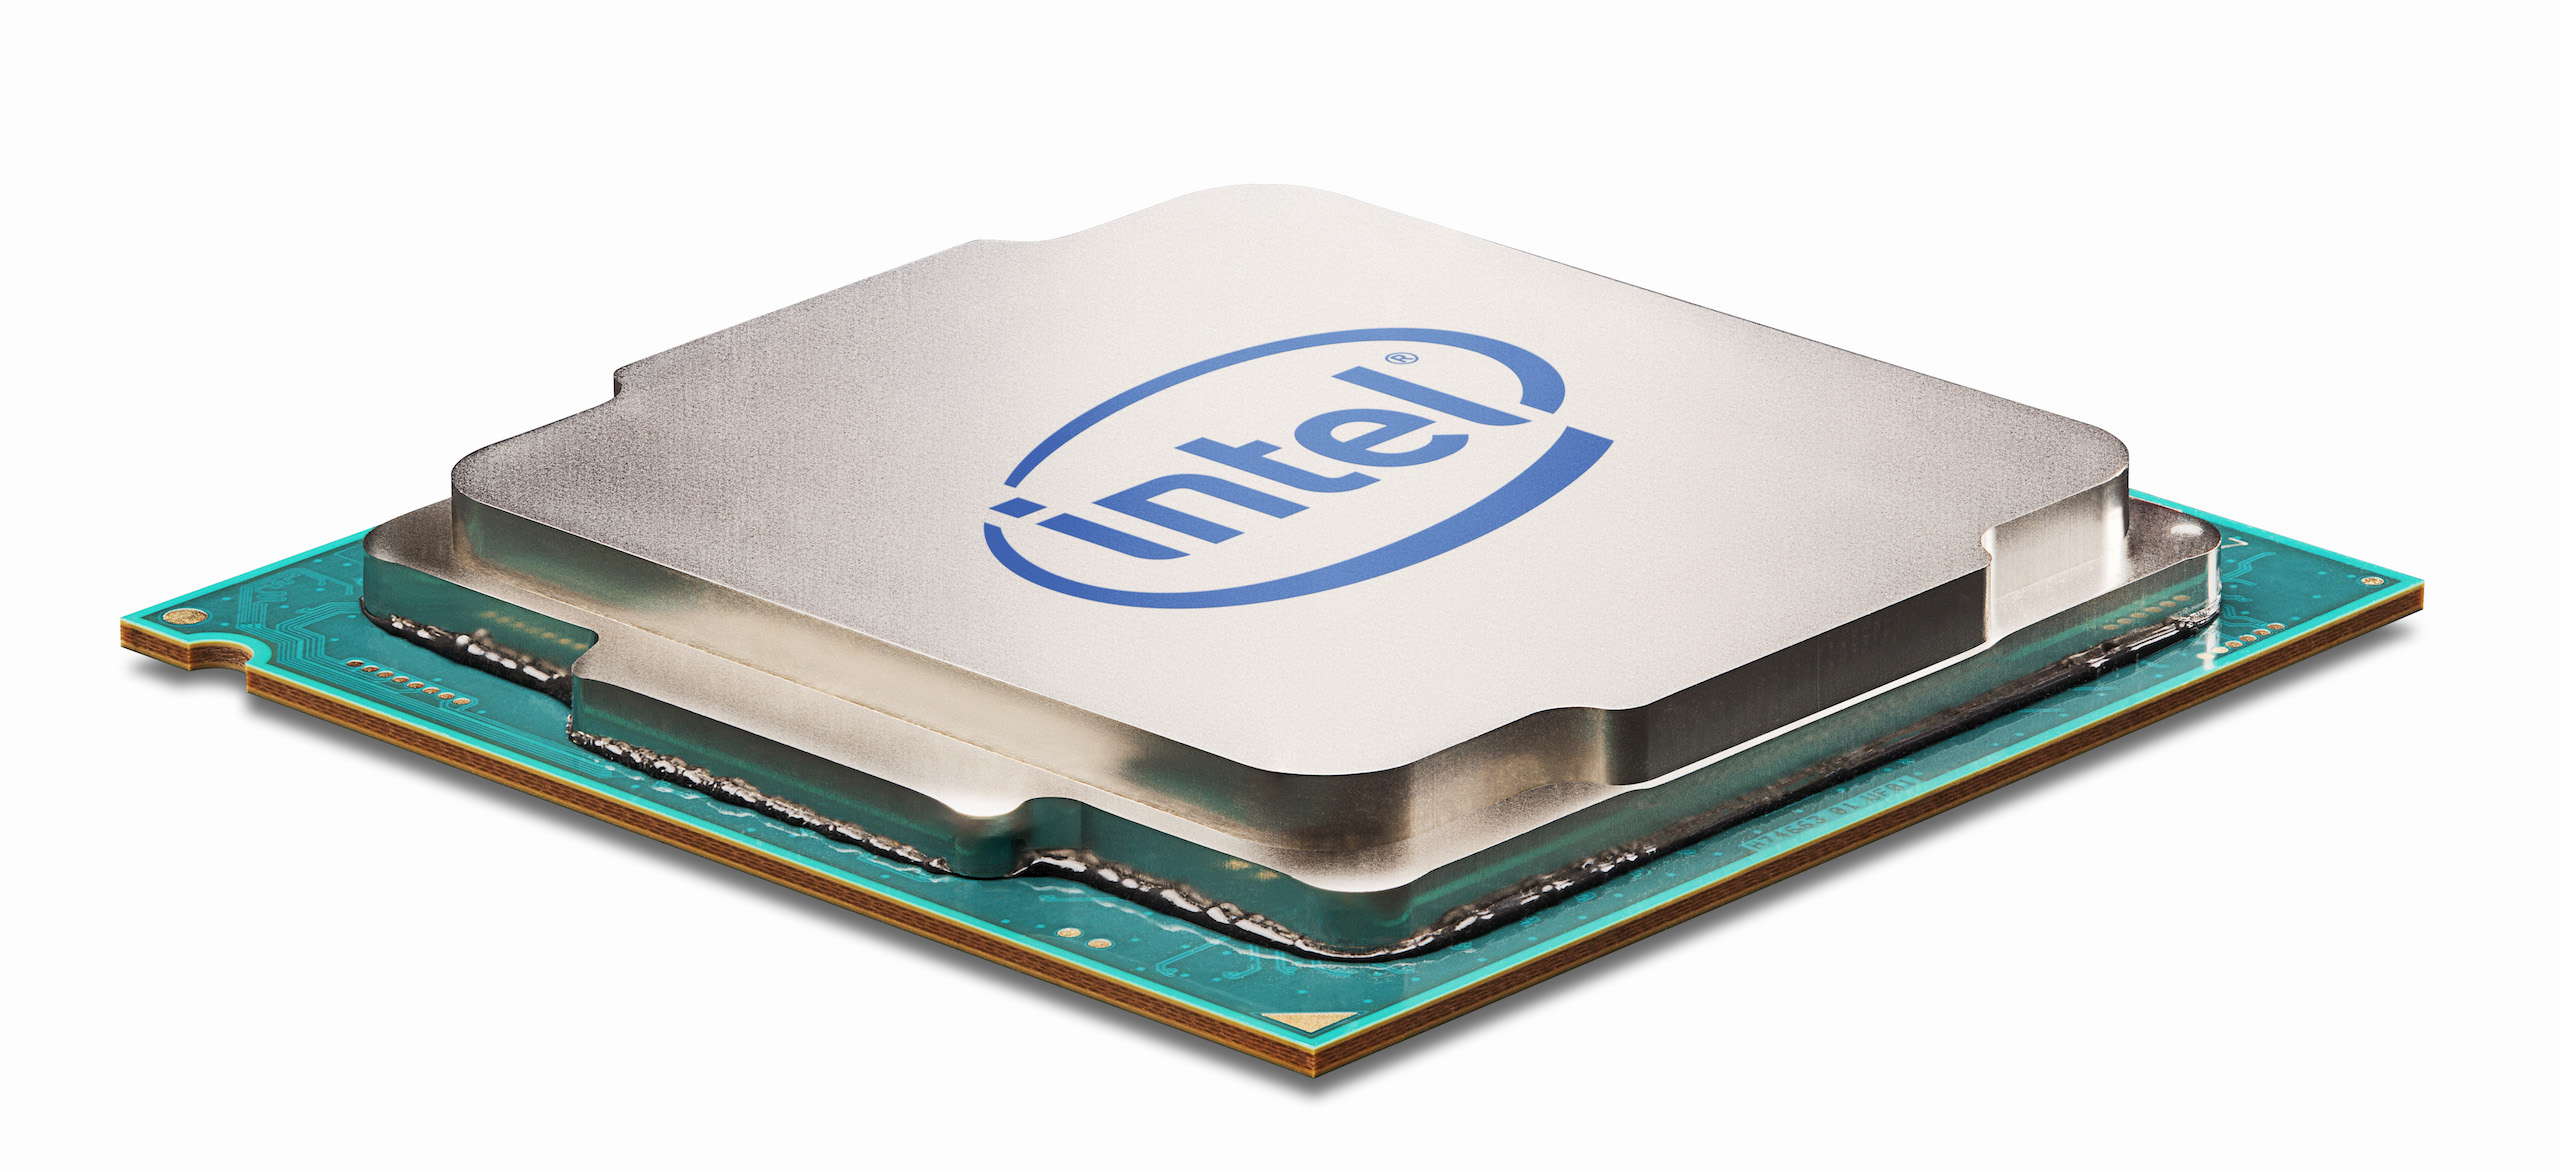 processor microcode firmware for intel cpus de intel microcode